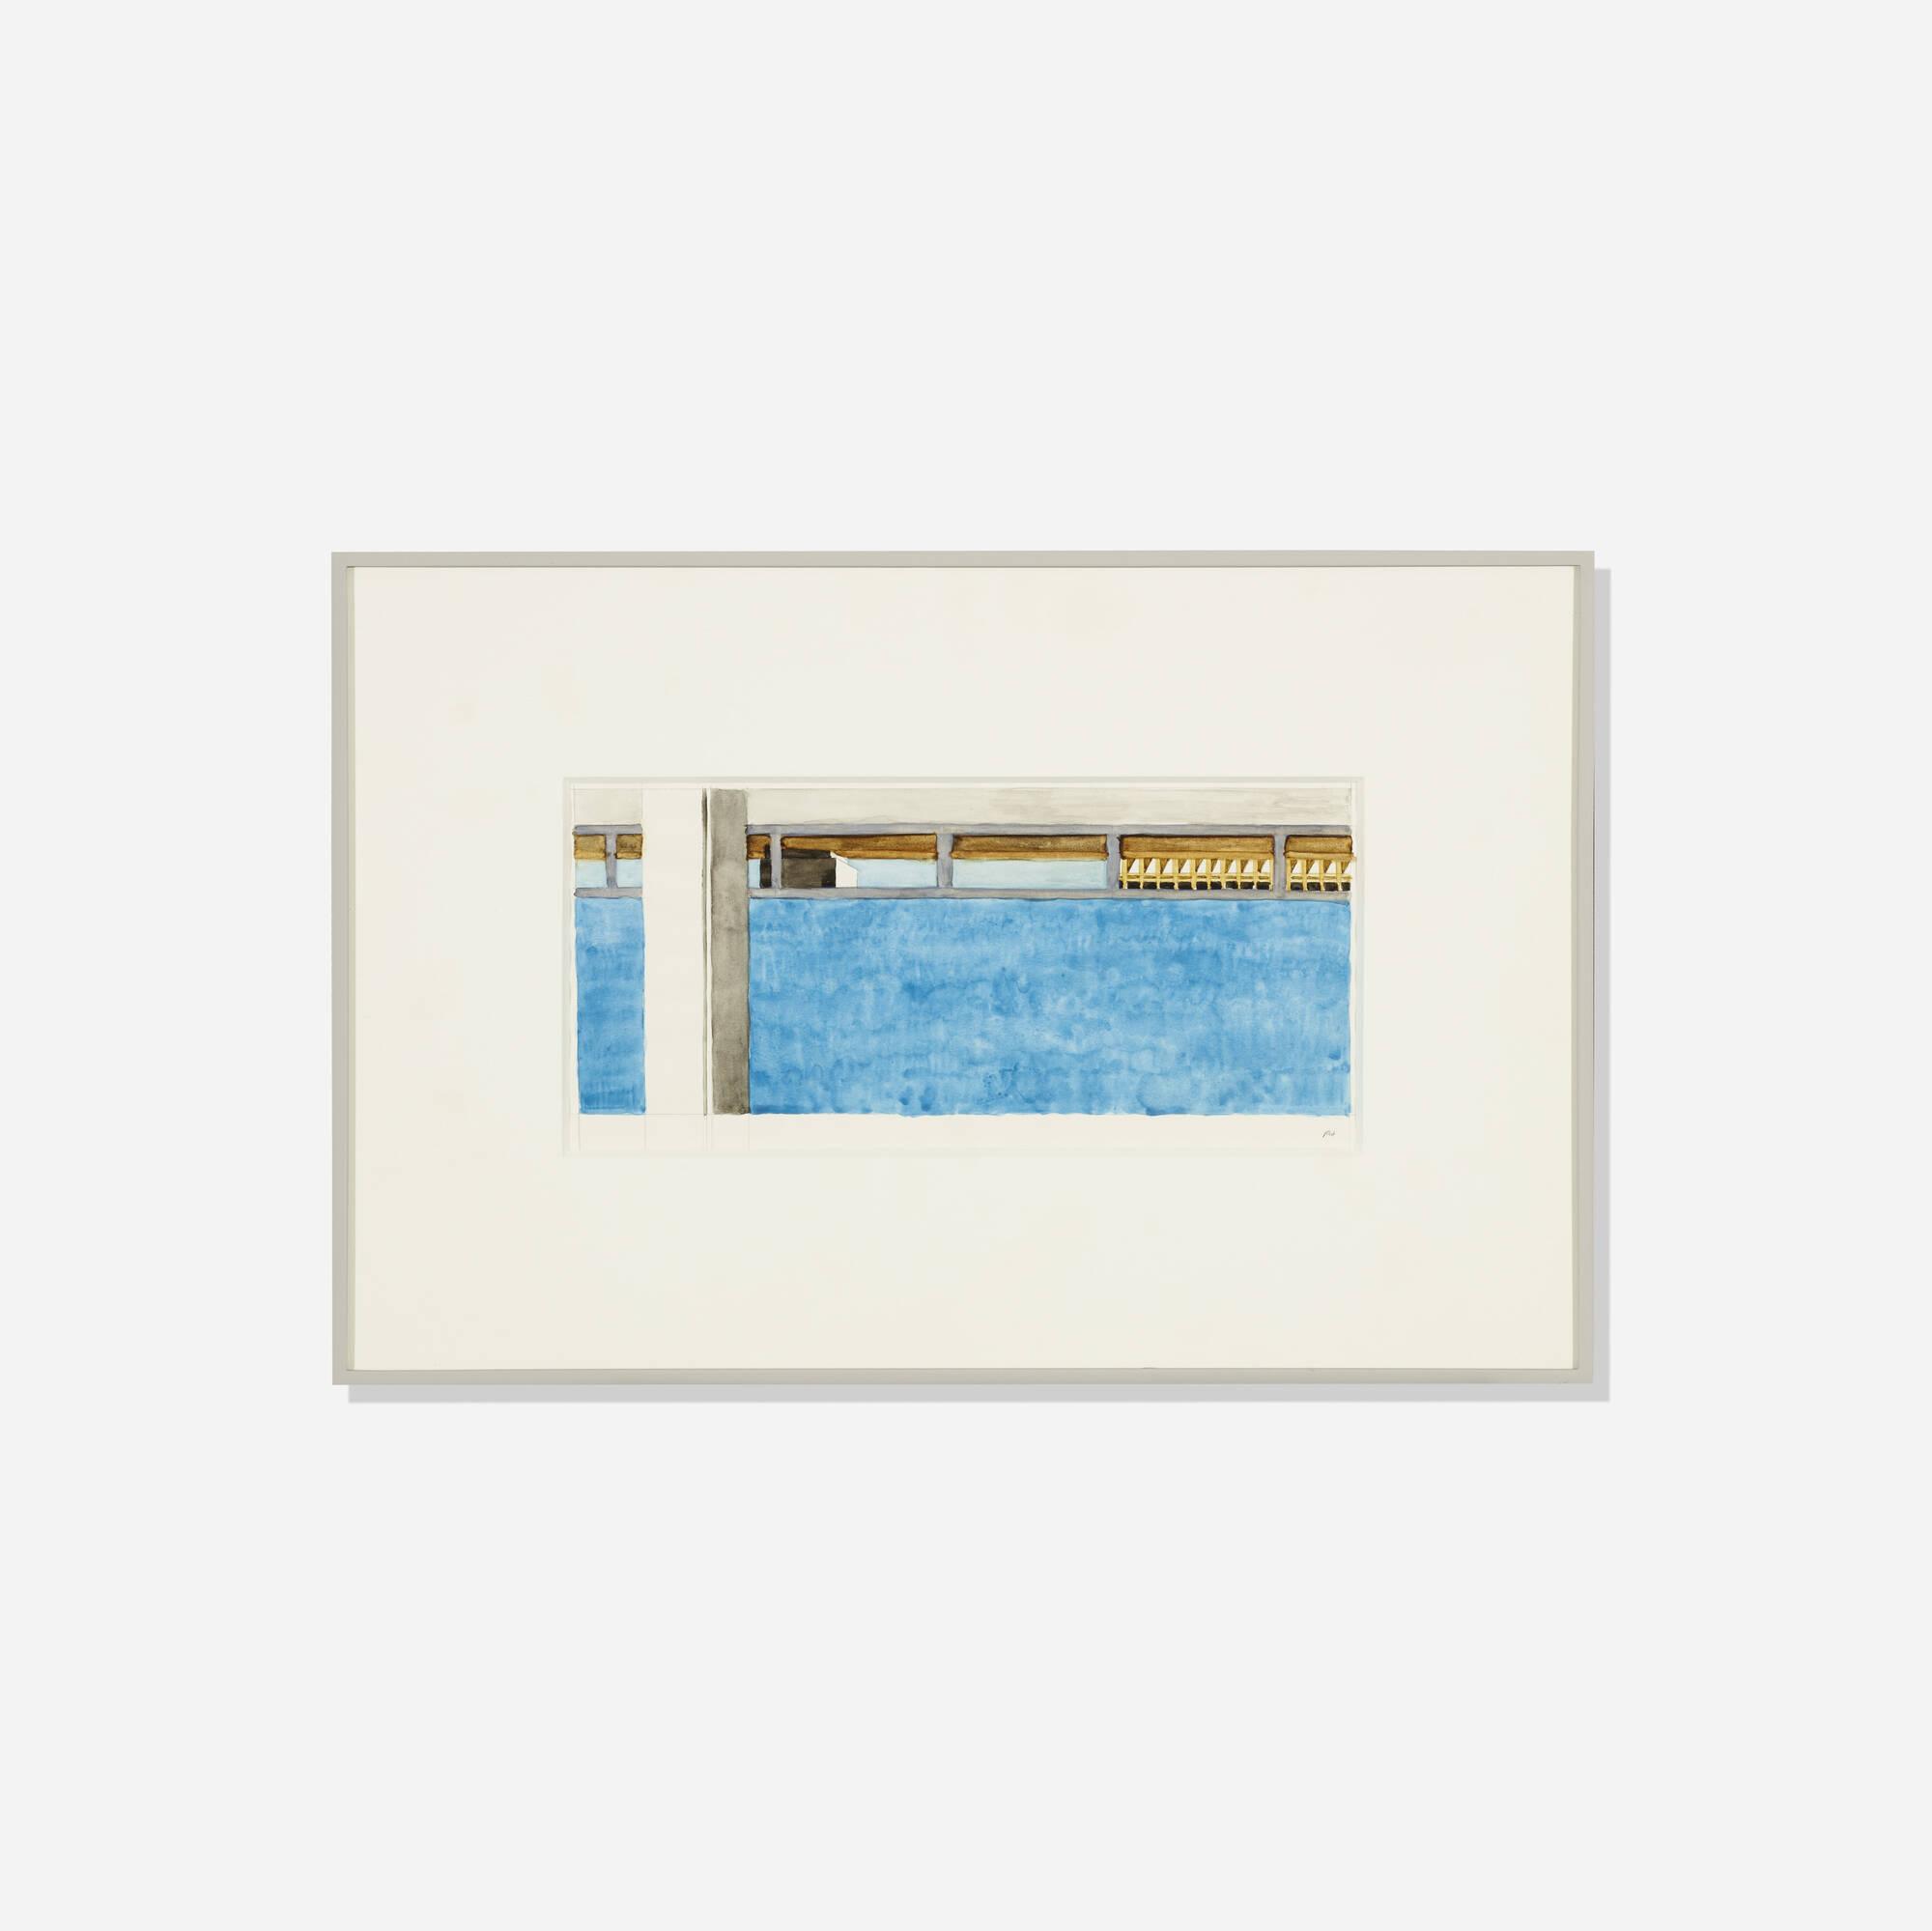 219: Robert Herrmann / Untitled (1 of 1)